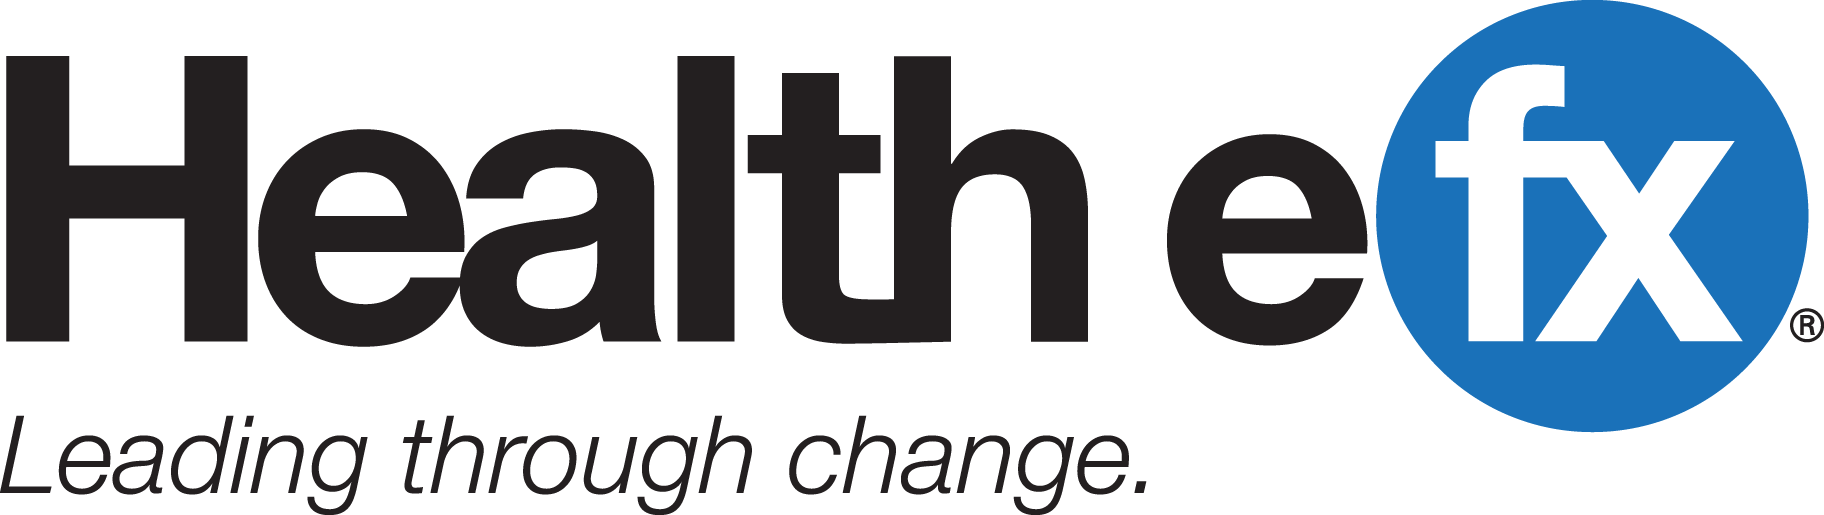 hefx_color_logo